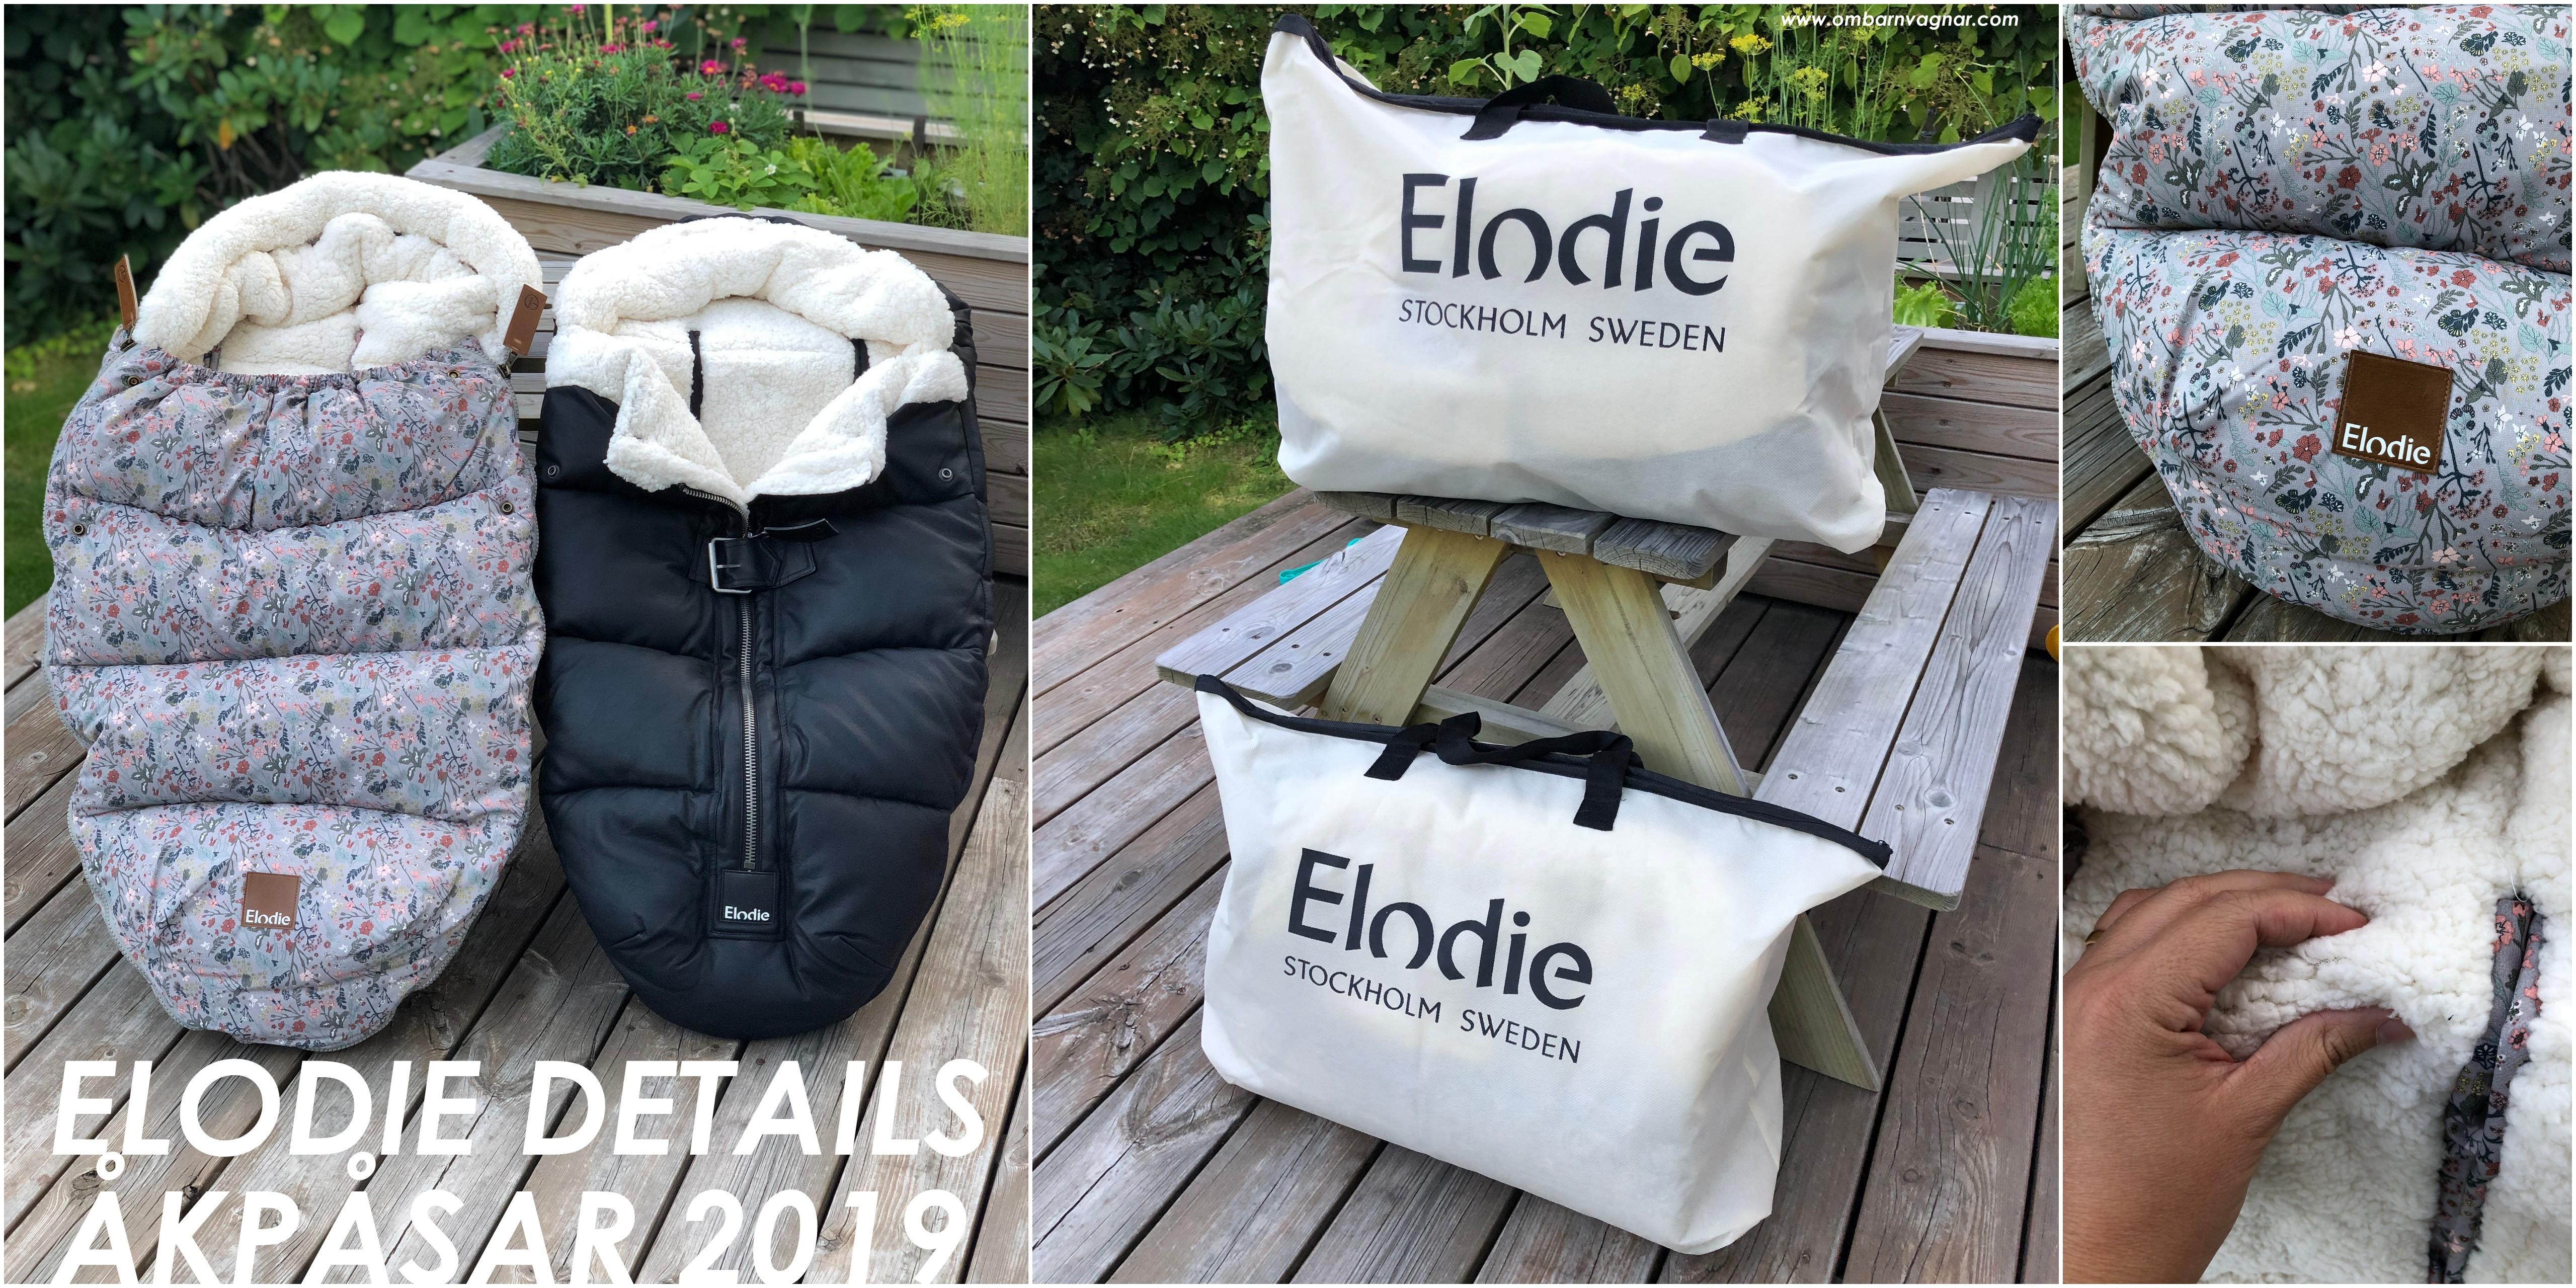 Elodie Details åkpåsar 2019